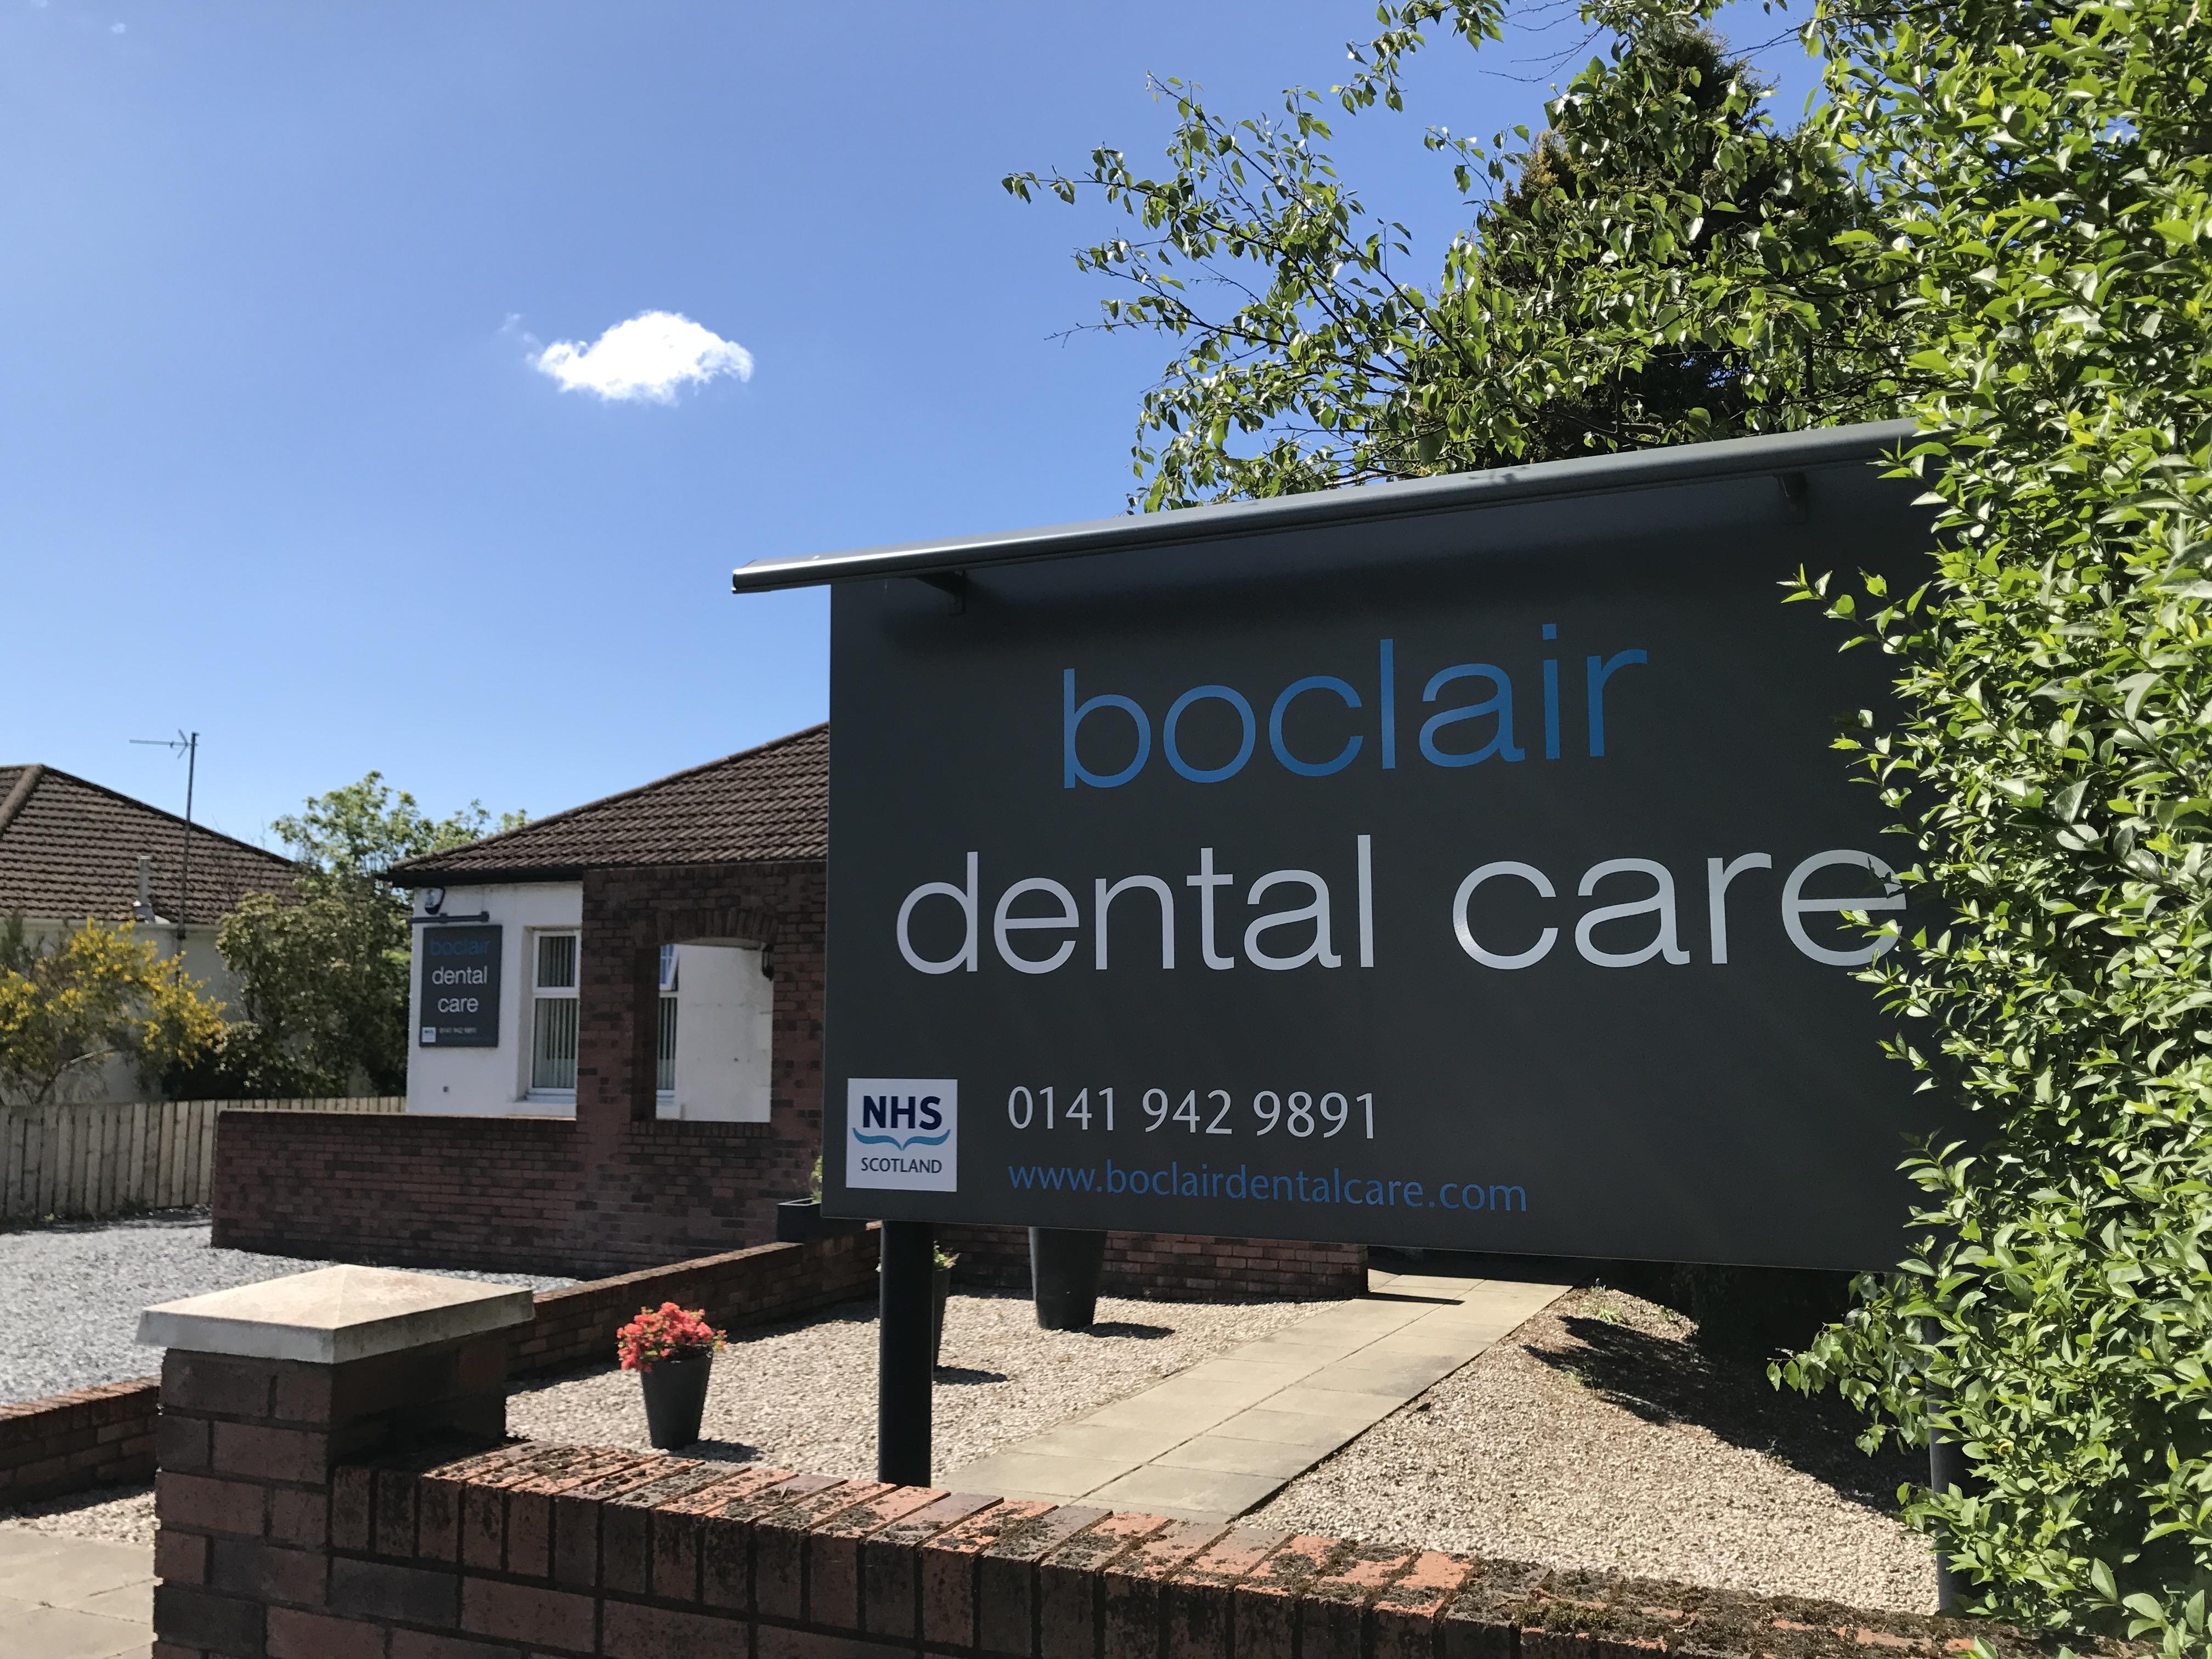 boclair dental care